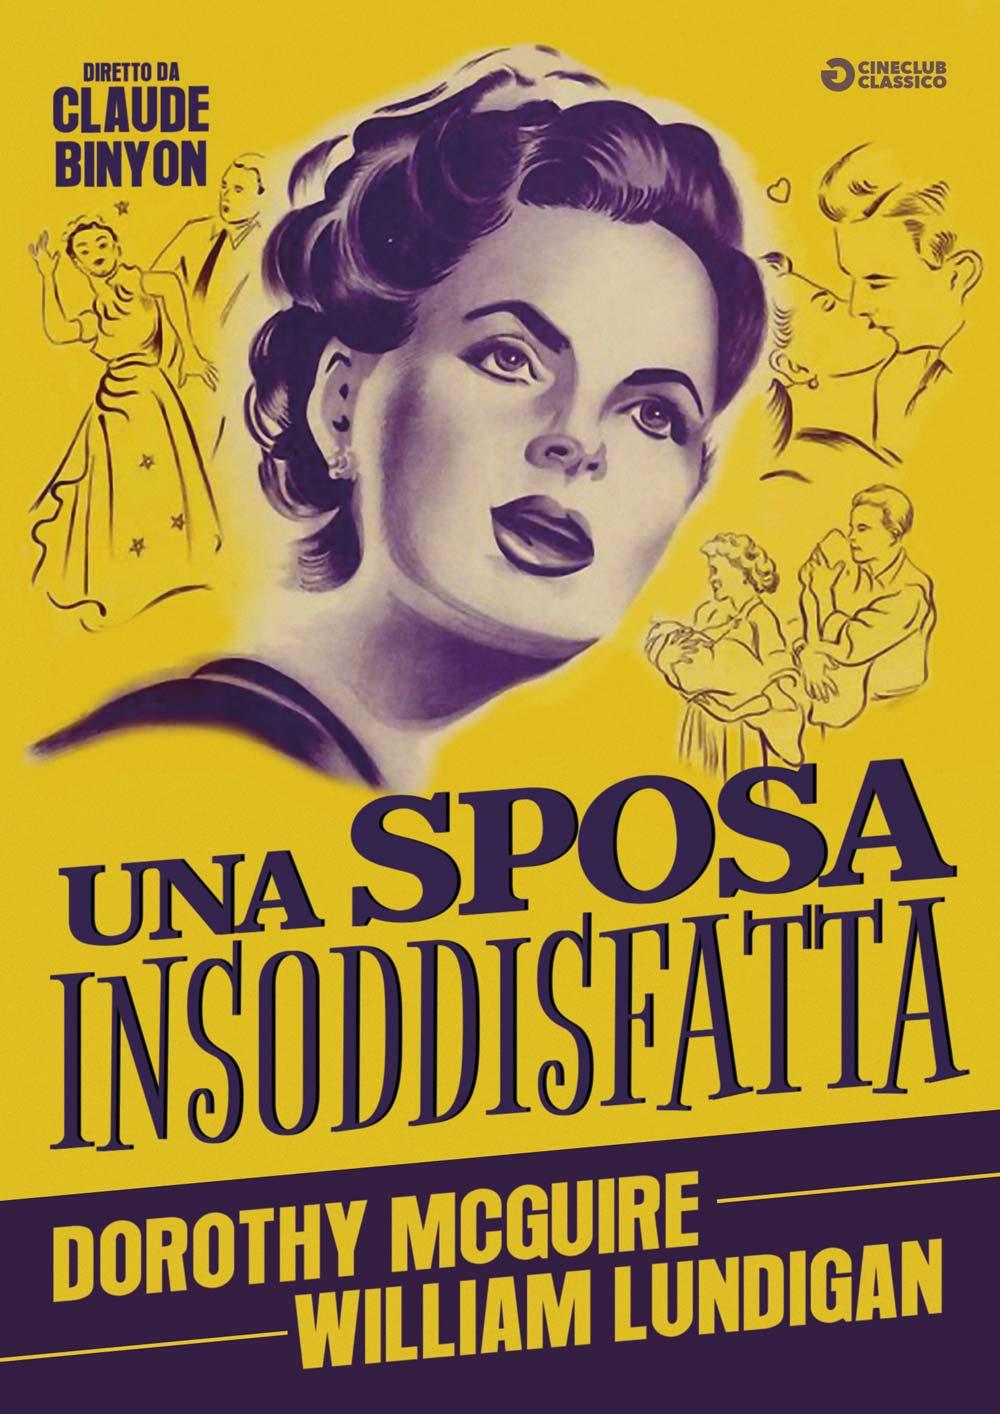 UNA SPOSA INSODDISFATTA (DVD)